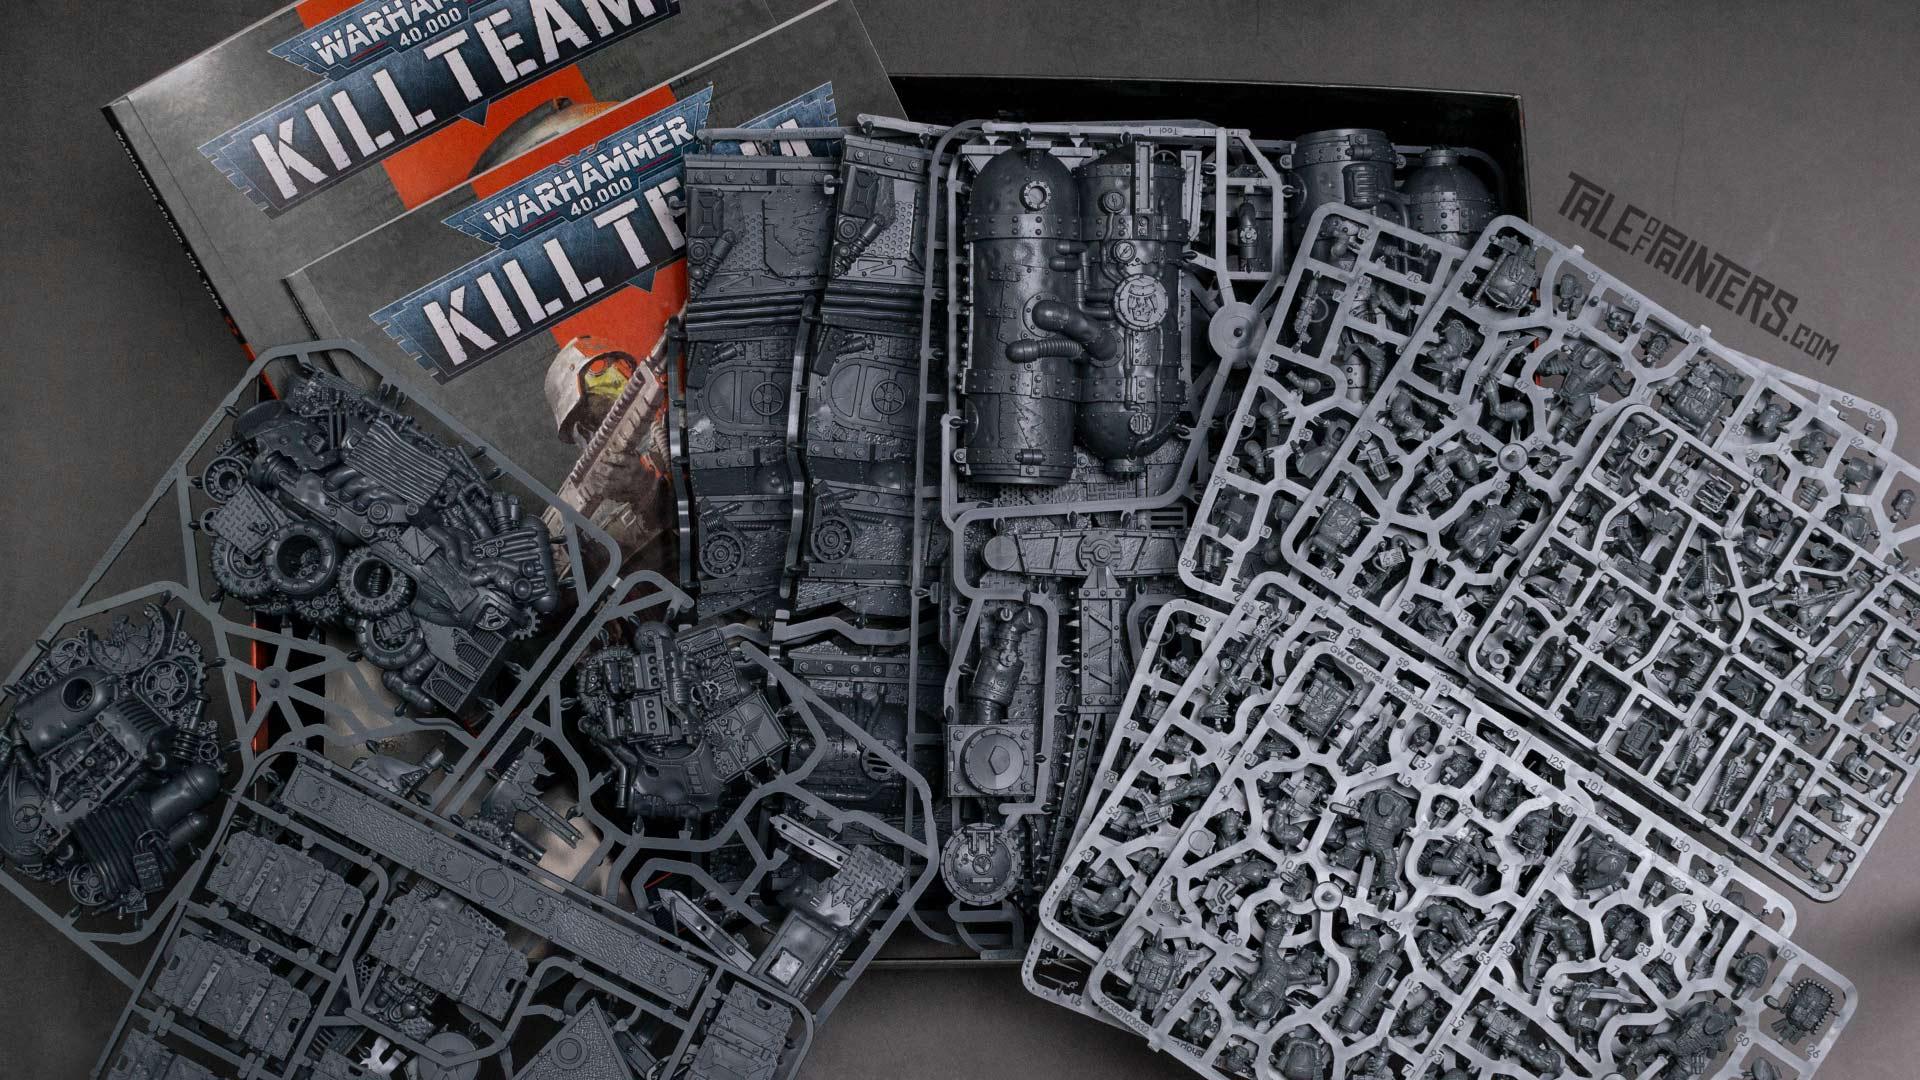 Kill Team: Octarius box opened